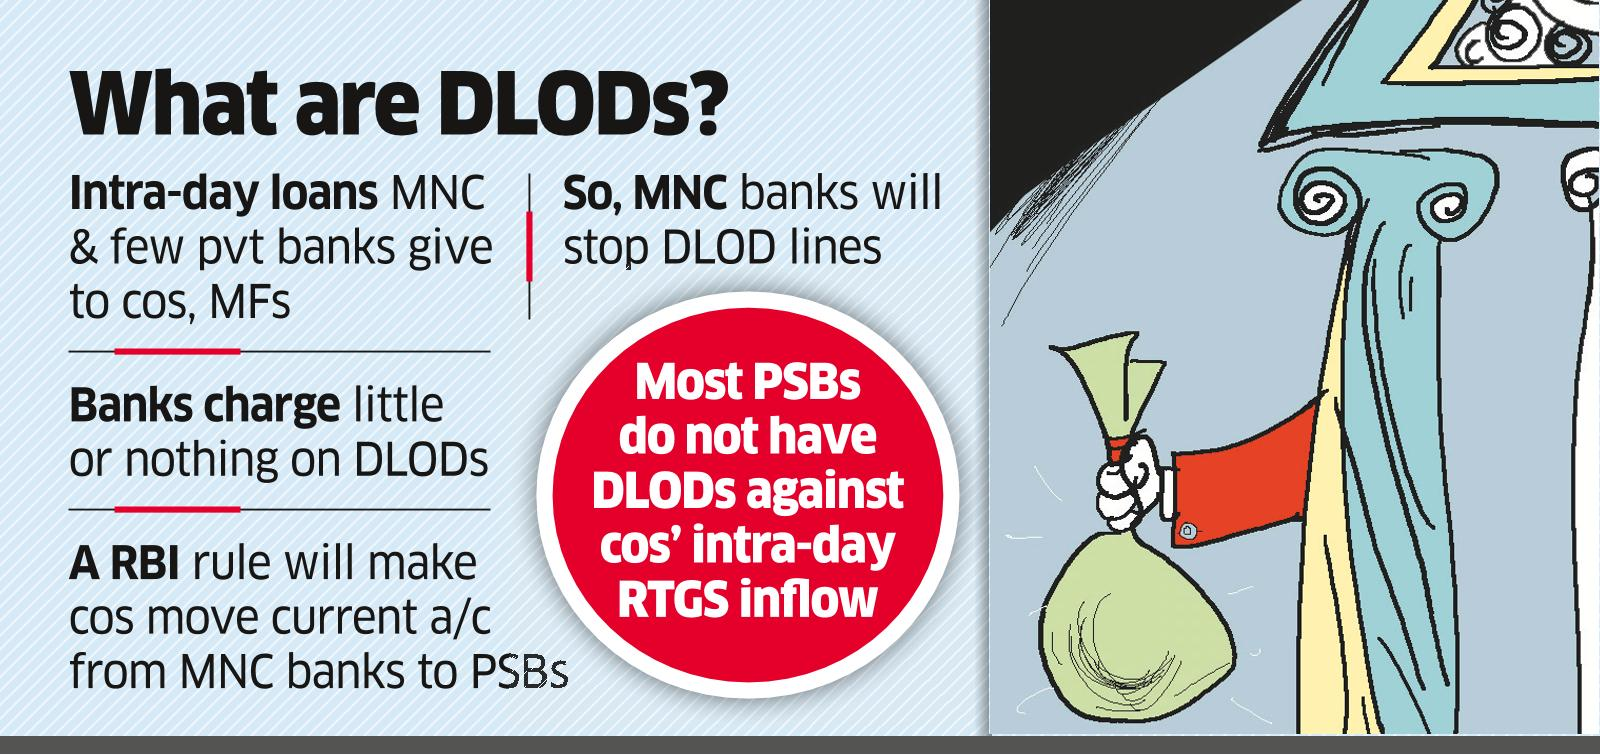 PSBs Plan 'Daylight ODs' to Woo Top Cos